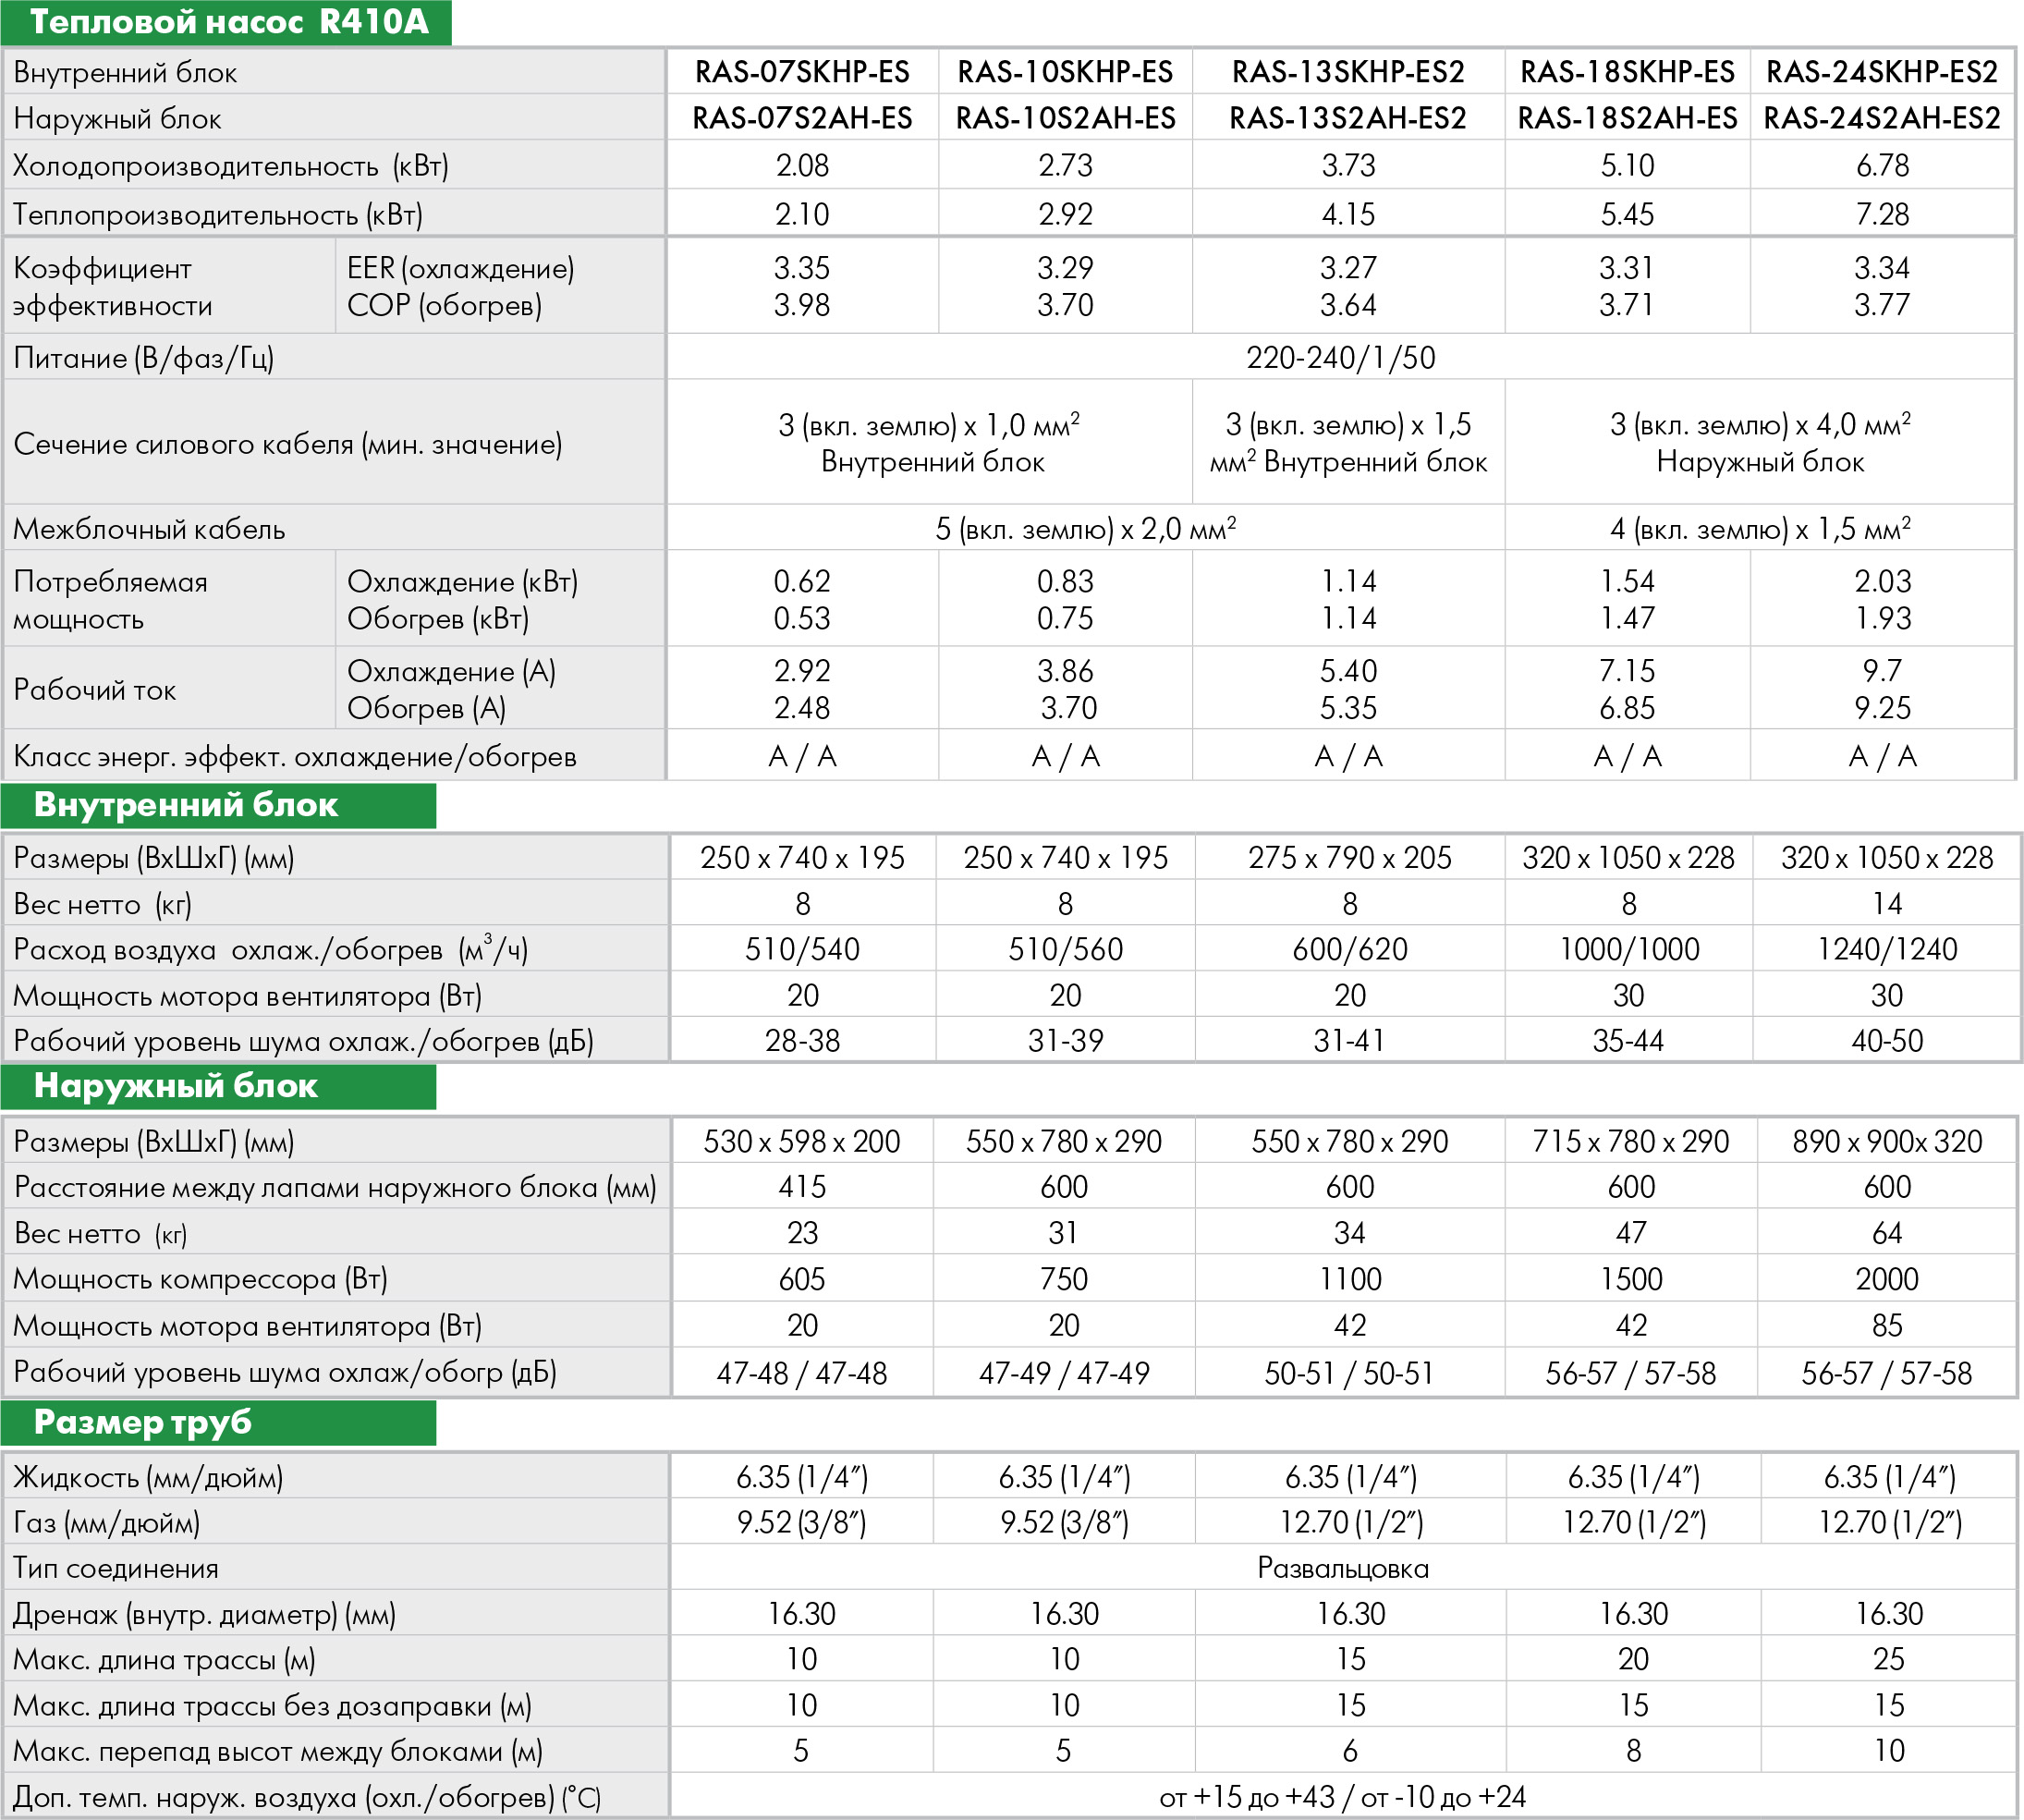 Технические характеристики кондиционера Toshiba RAS-13SKHP-ES2 / RAS-13S2AH-ES2 серии SKHP